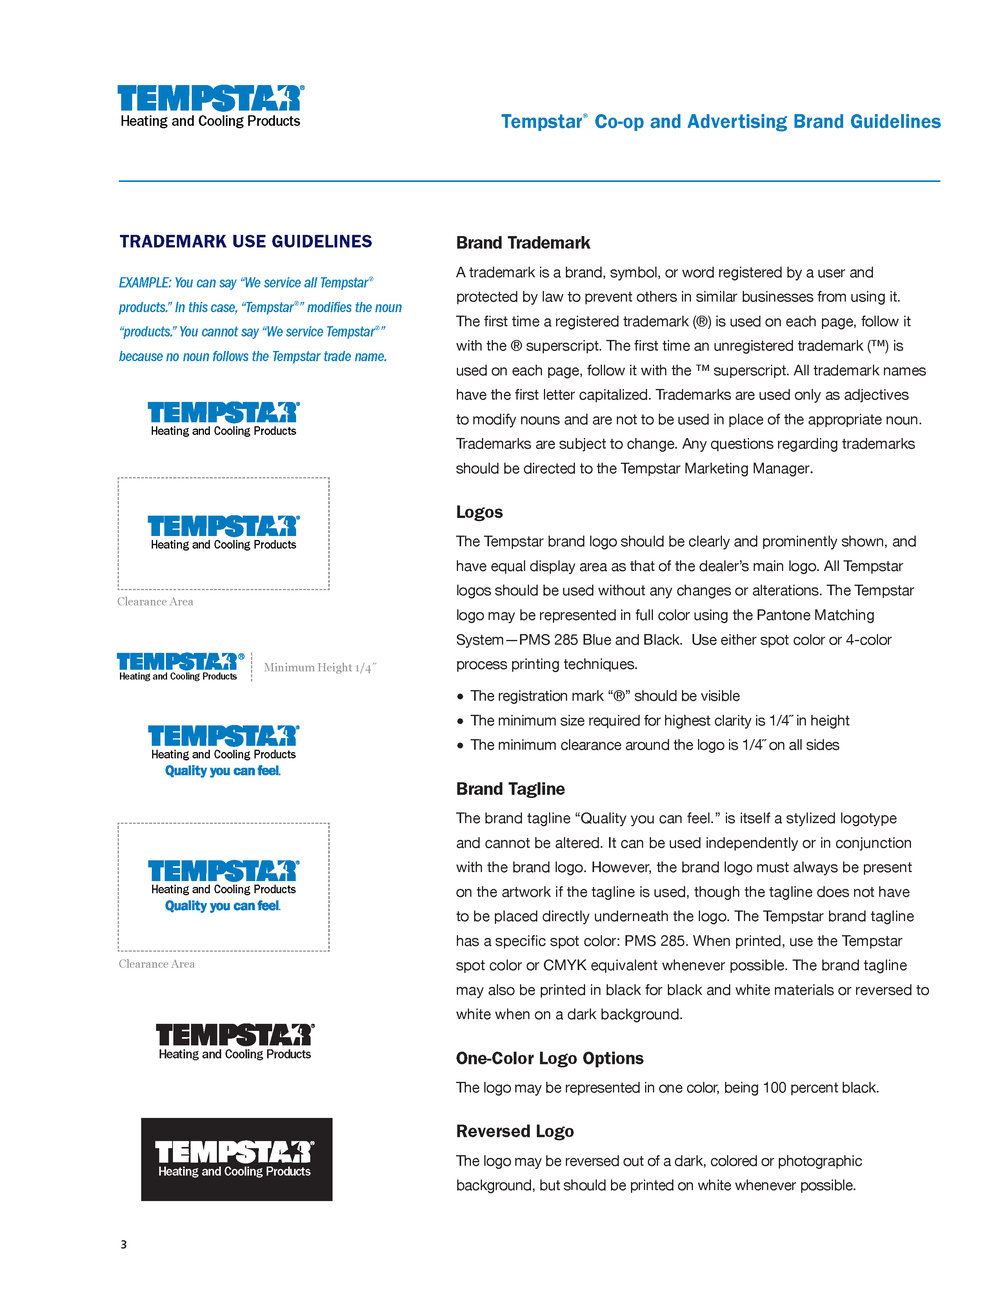 Tempstar_Page_3.jpg